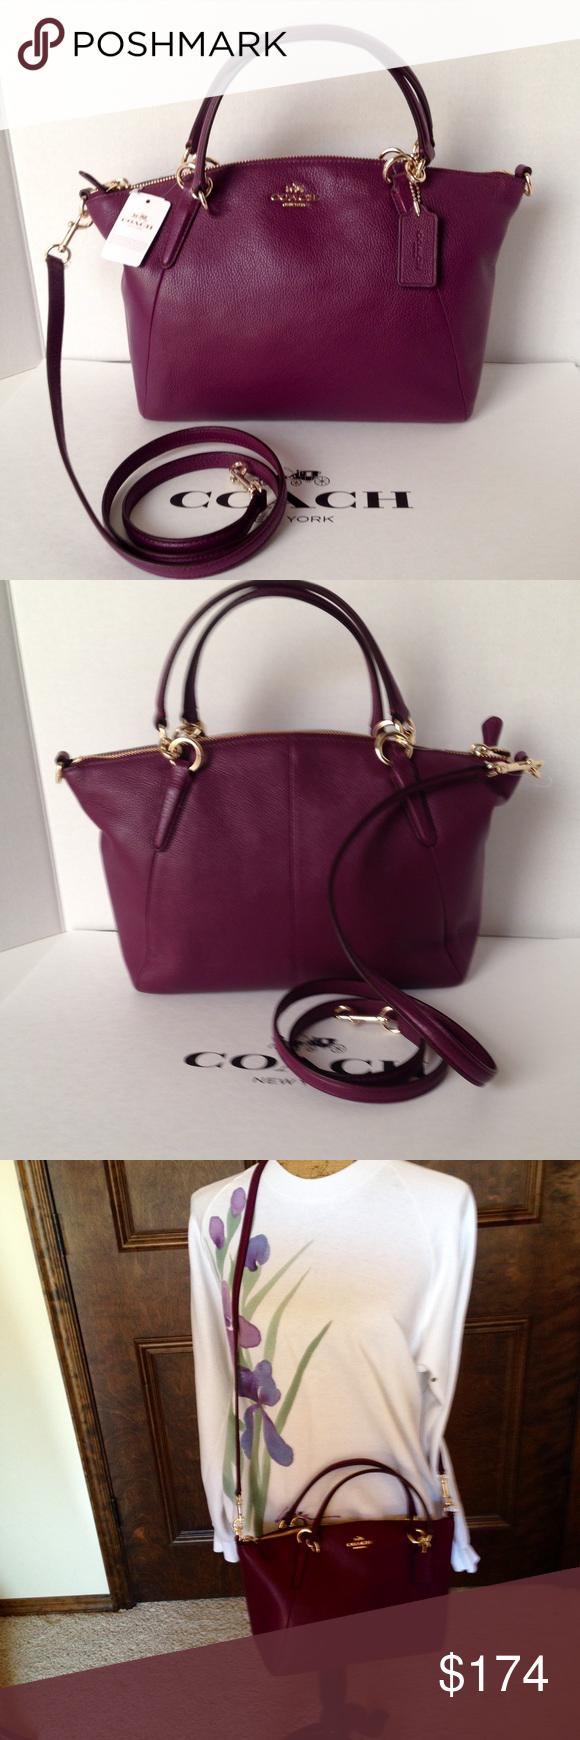 ff088134bfda SALE❤️NWT Coach Pebble Leather Kelsey Handbag Coach F36675 pebbled leather  small satchel Crossbody